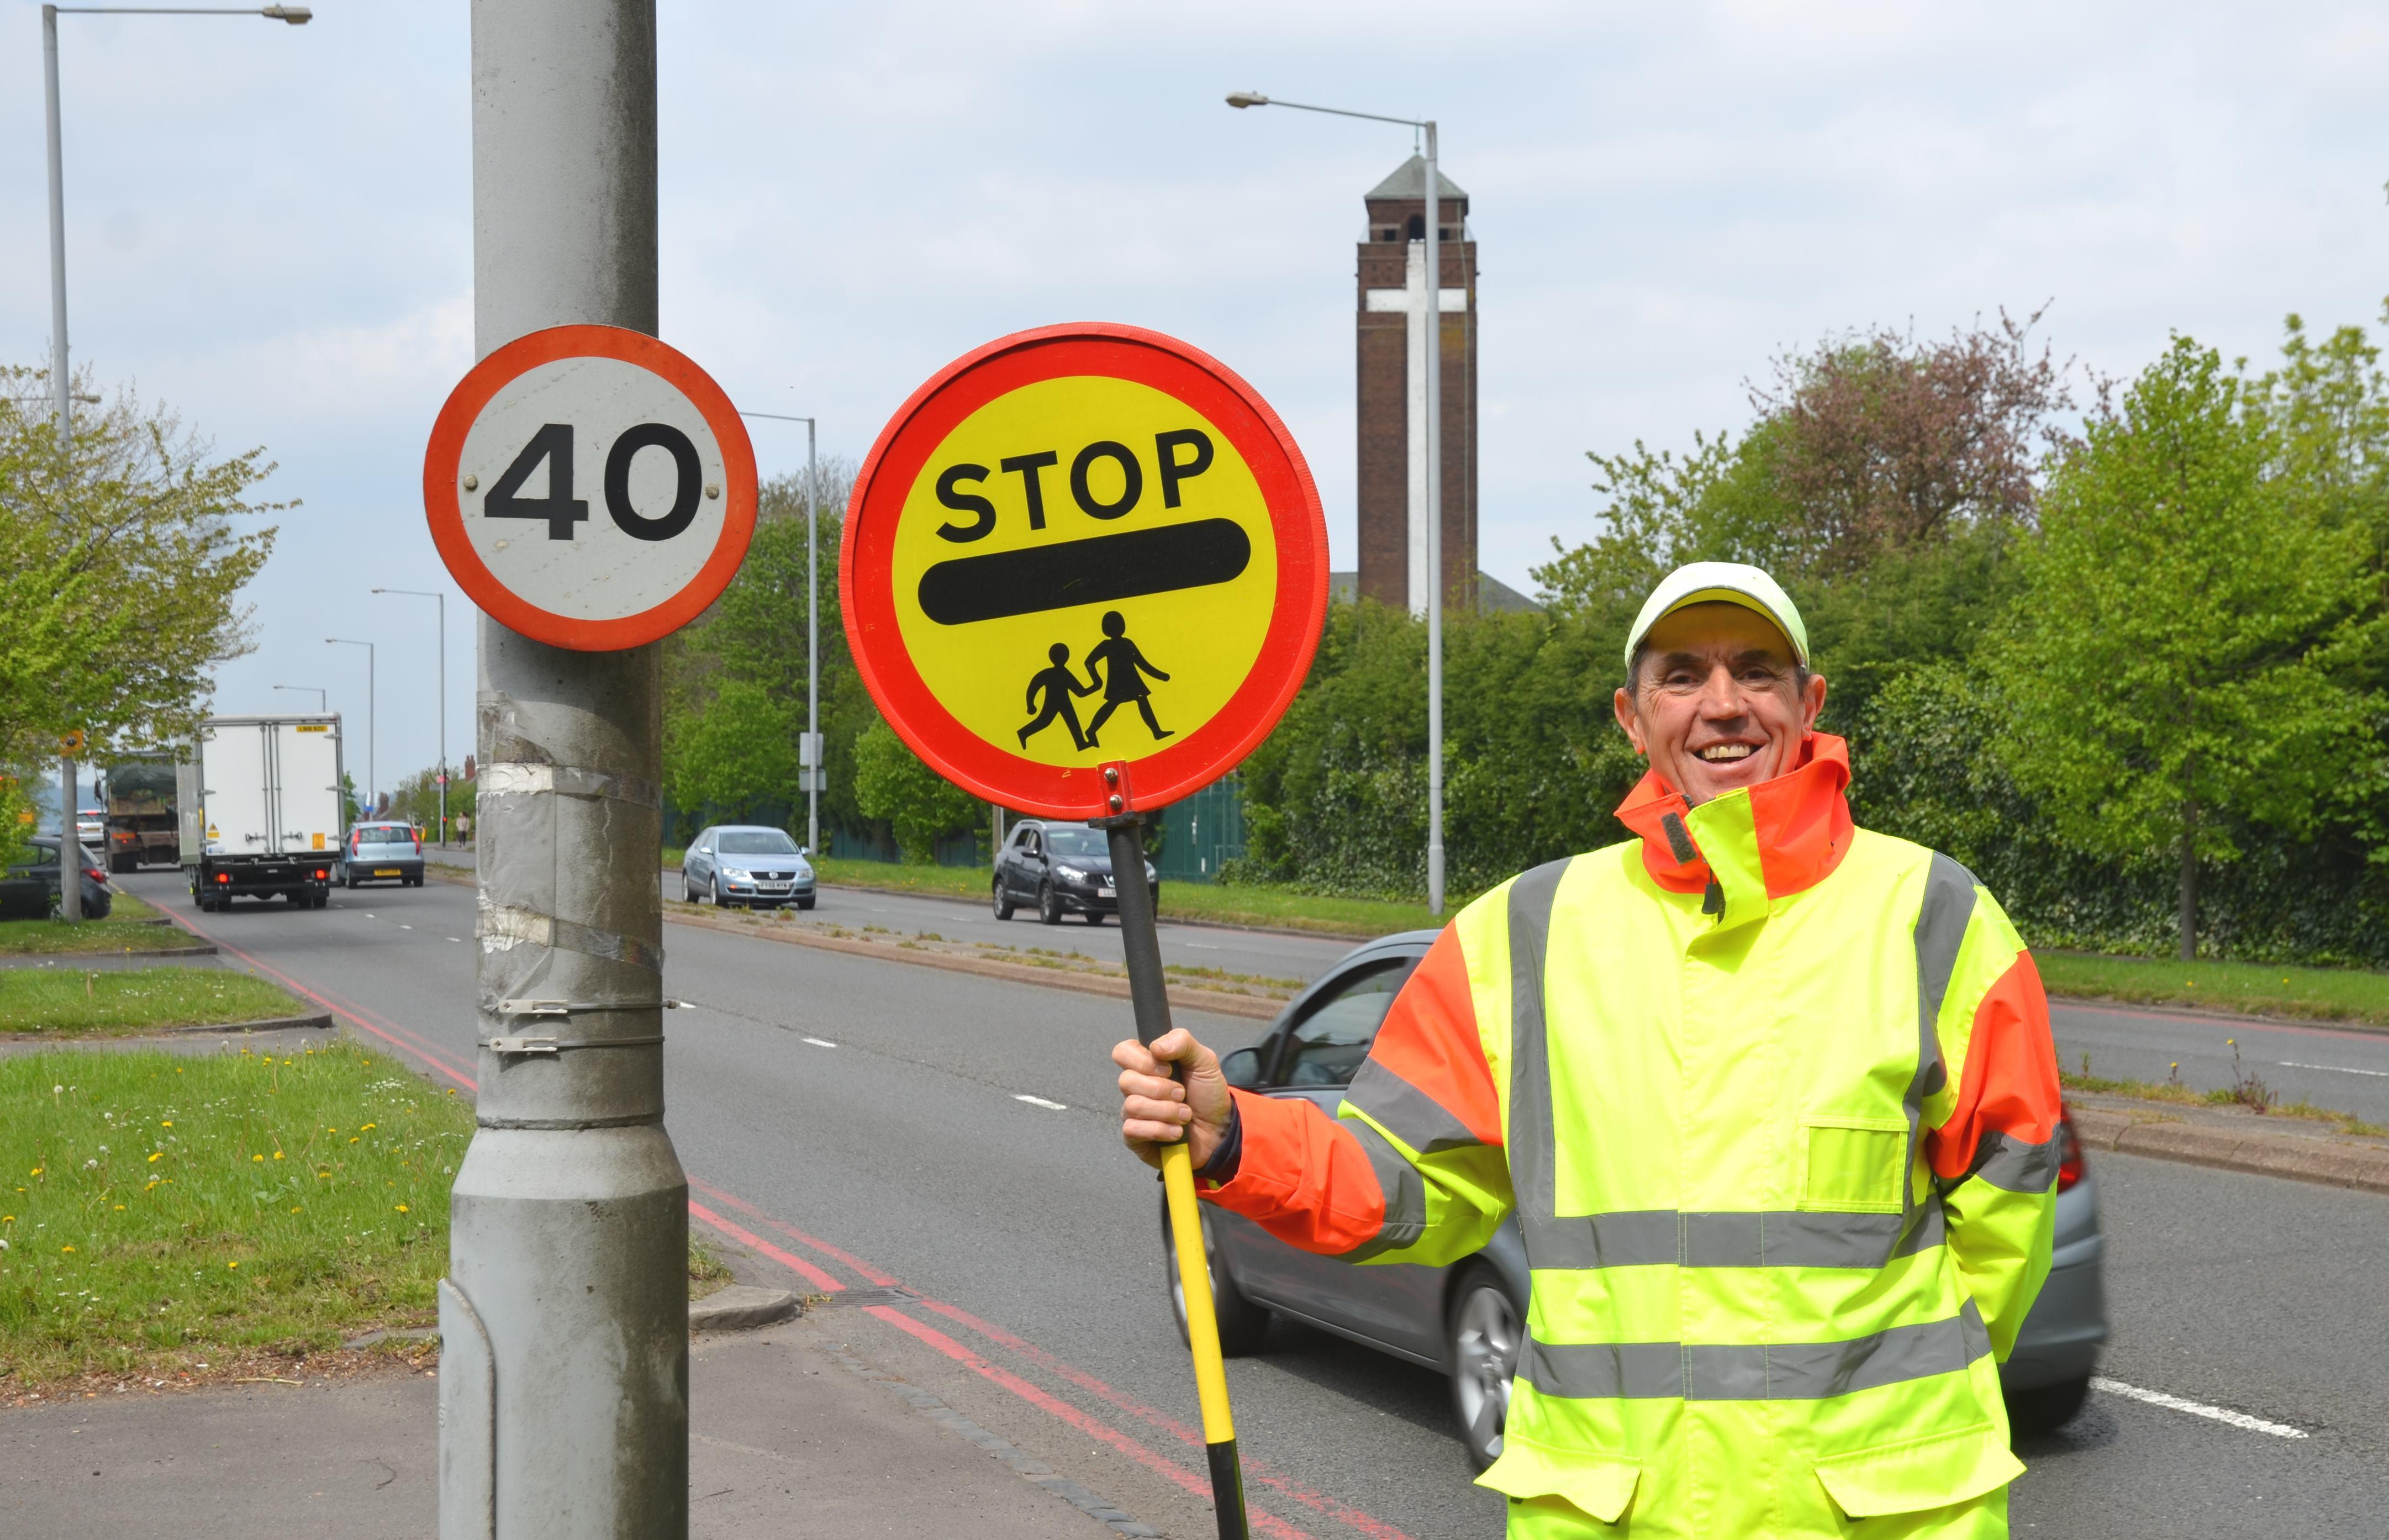 Lollipop man safeguarding the community Image